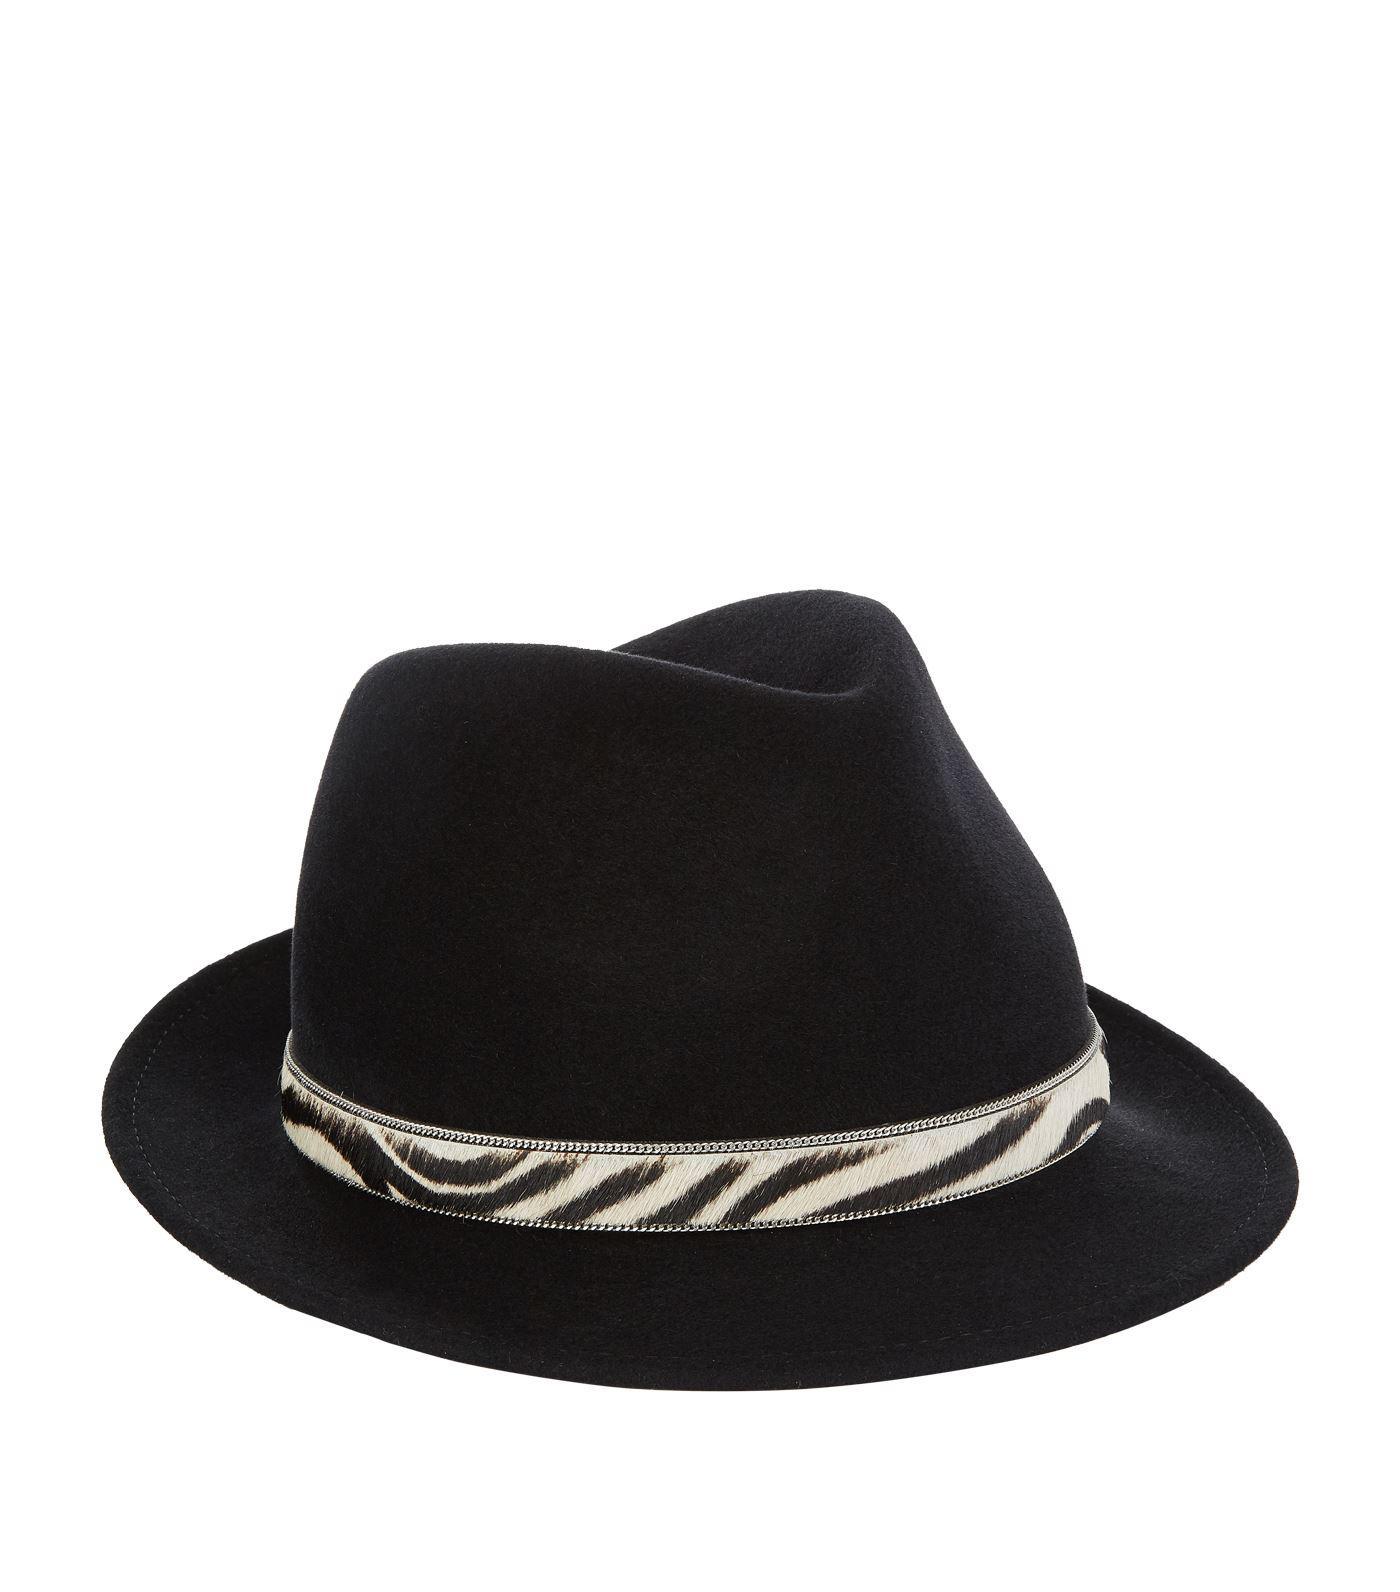 Philip Treacy Unicorn Pin Trilby Hat in White - Lyst 5f1bb288ed98